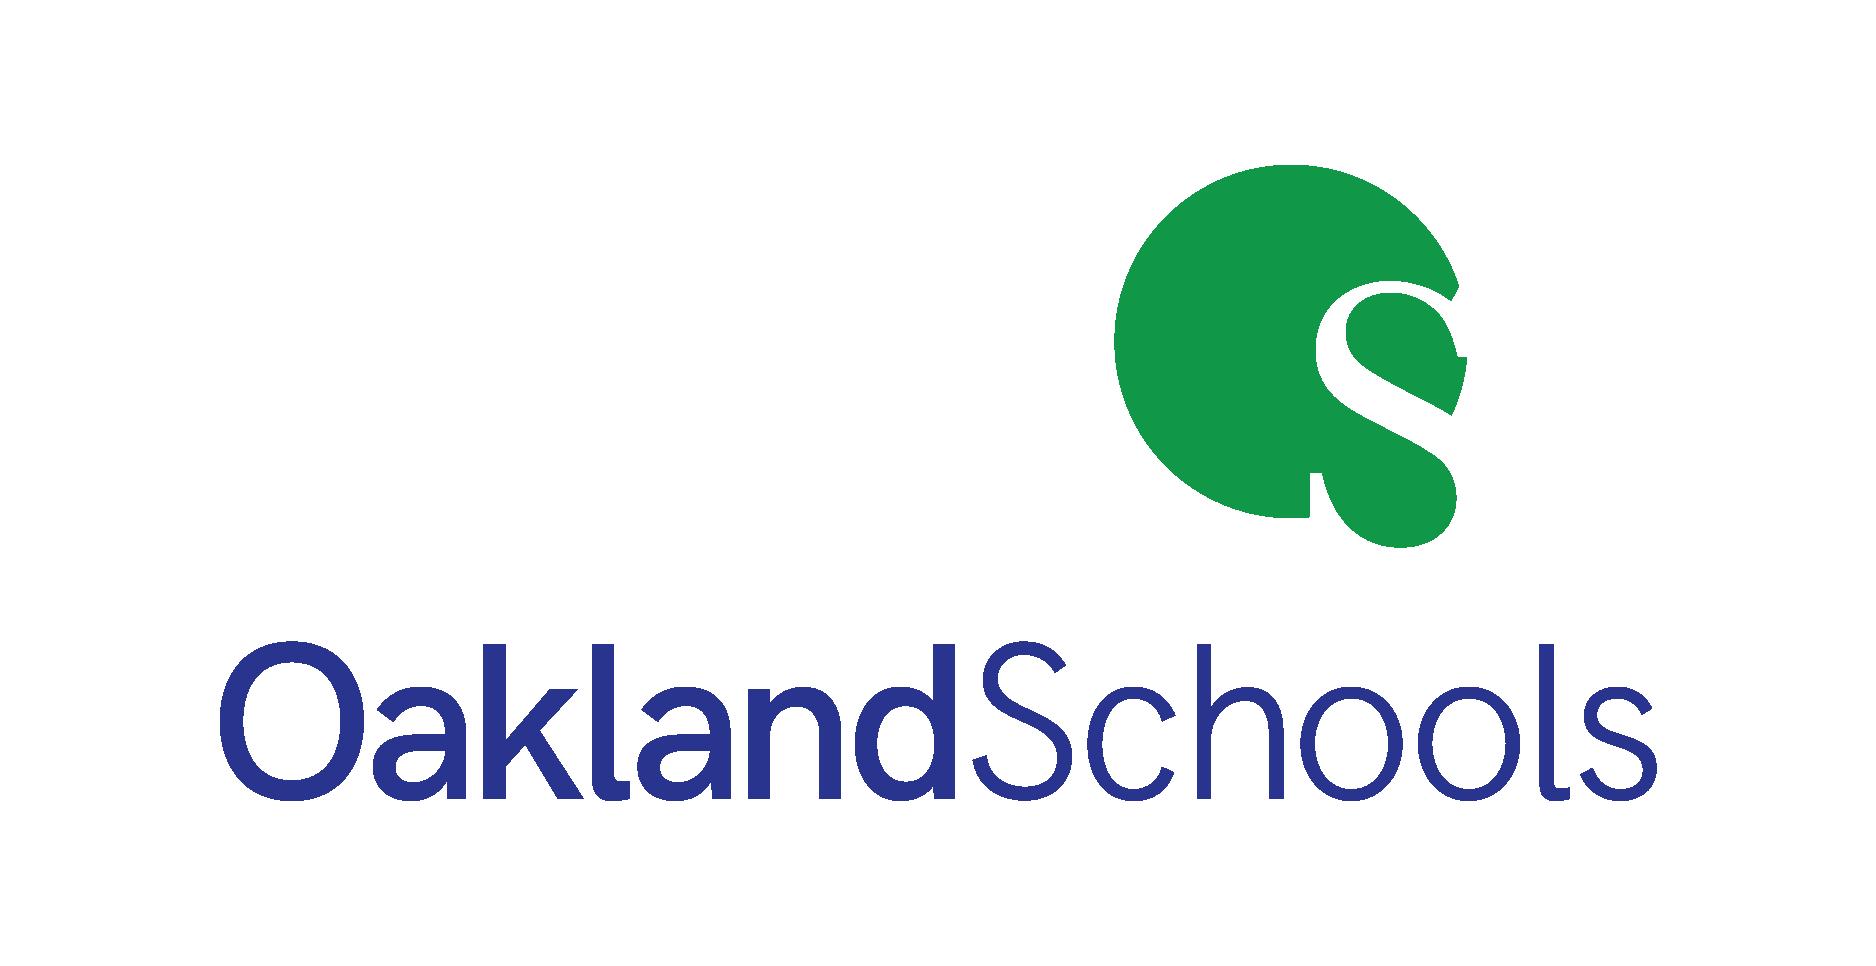 Oakland Schools photo 2